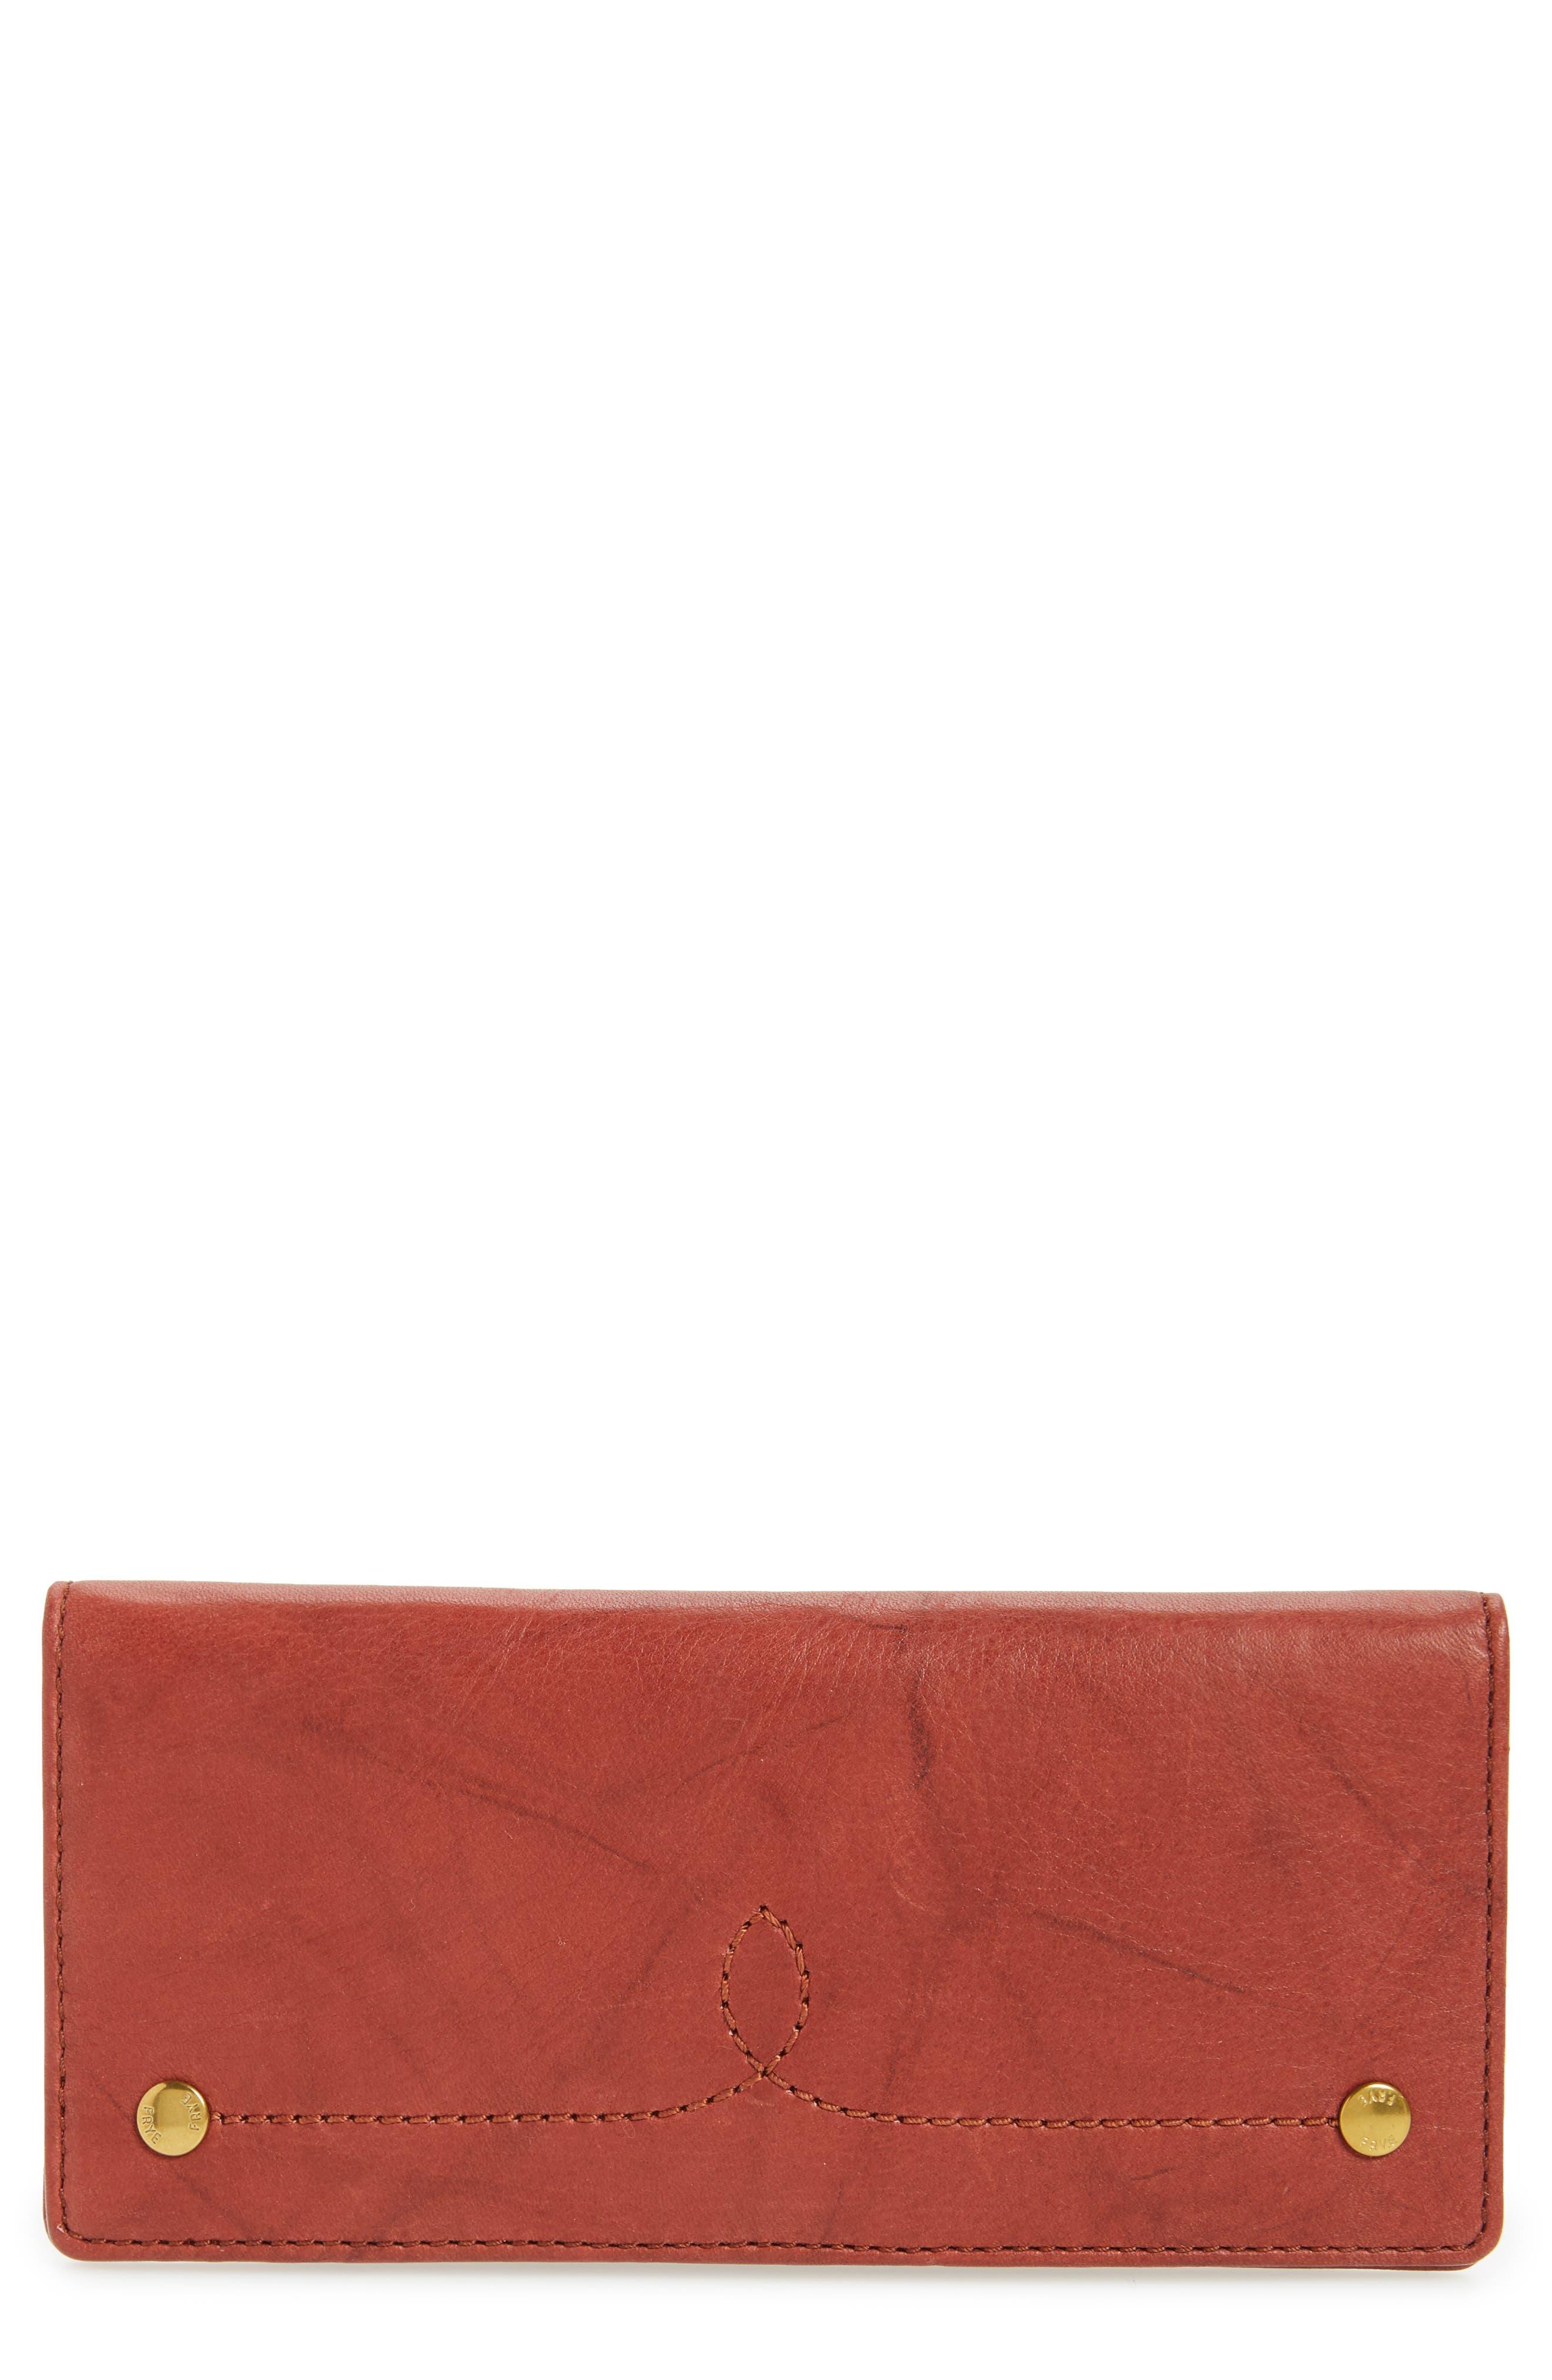 Frye Campus Rivet Slim Leather Wallet